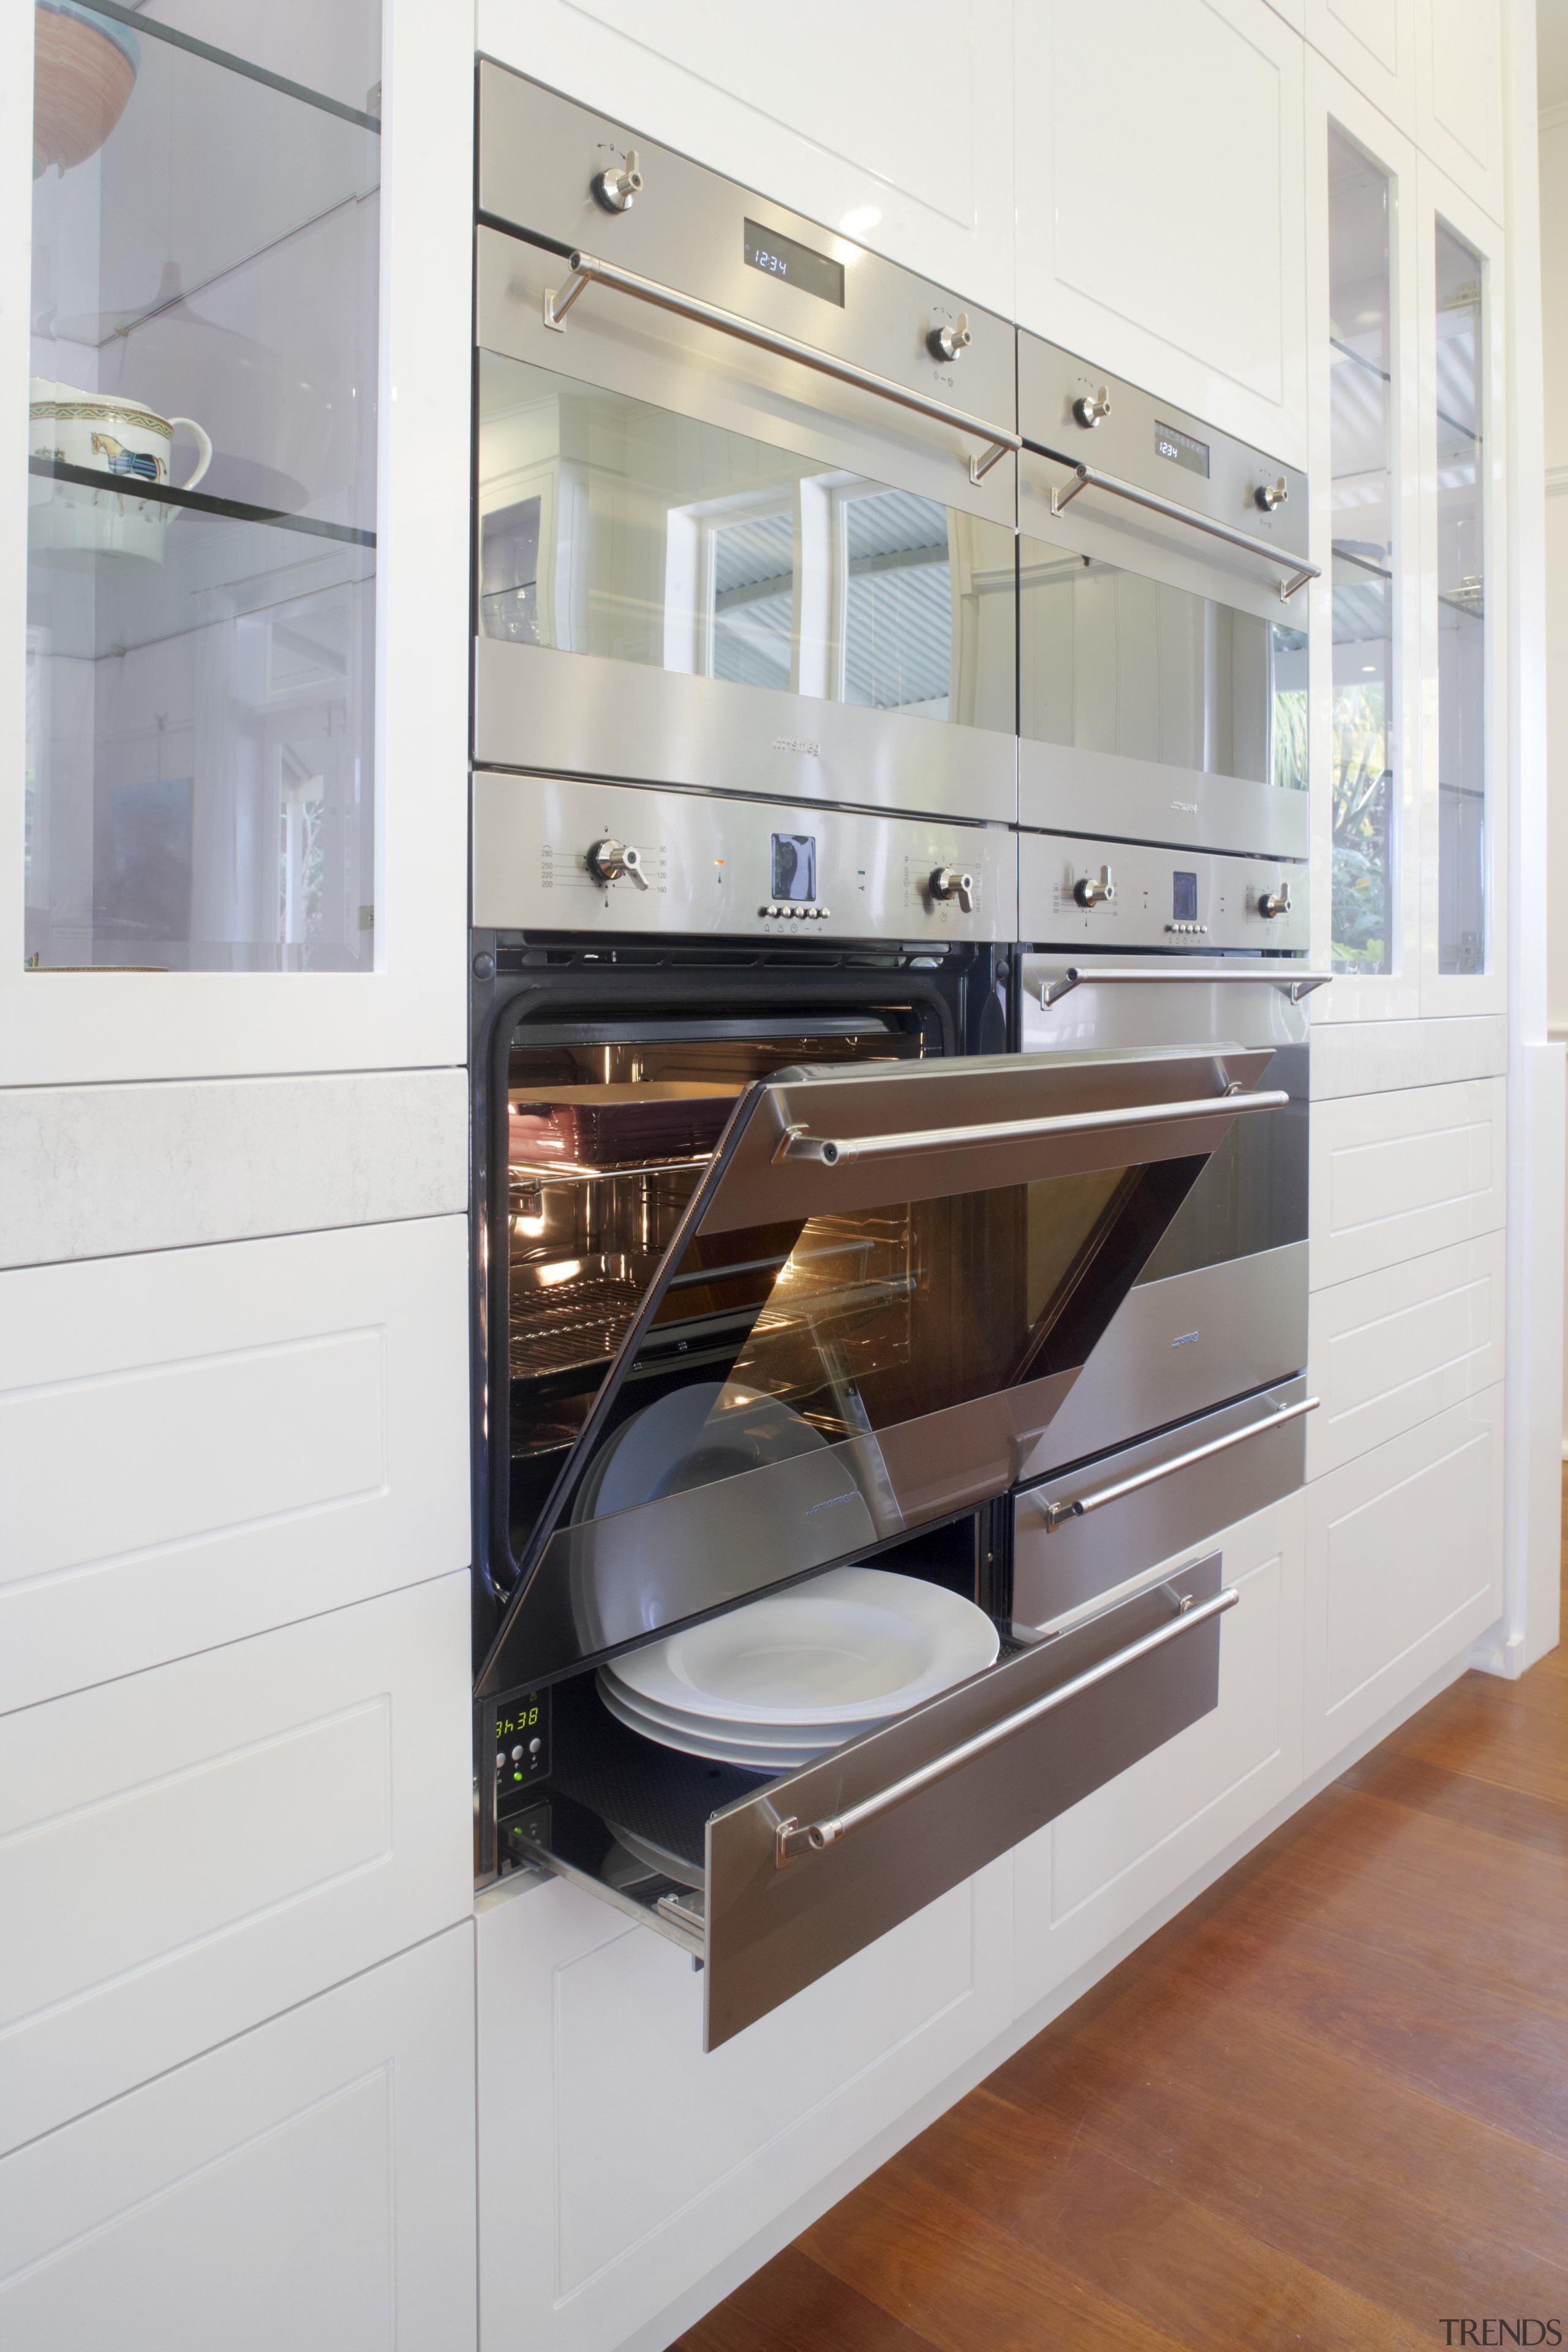 Designer Lynn Malone specified Smeg Classic ovens to countertop, cuisine classique, furniture, home appliance, interior design, kitchen, major appliance, product design, white, gray